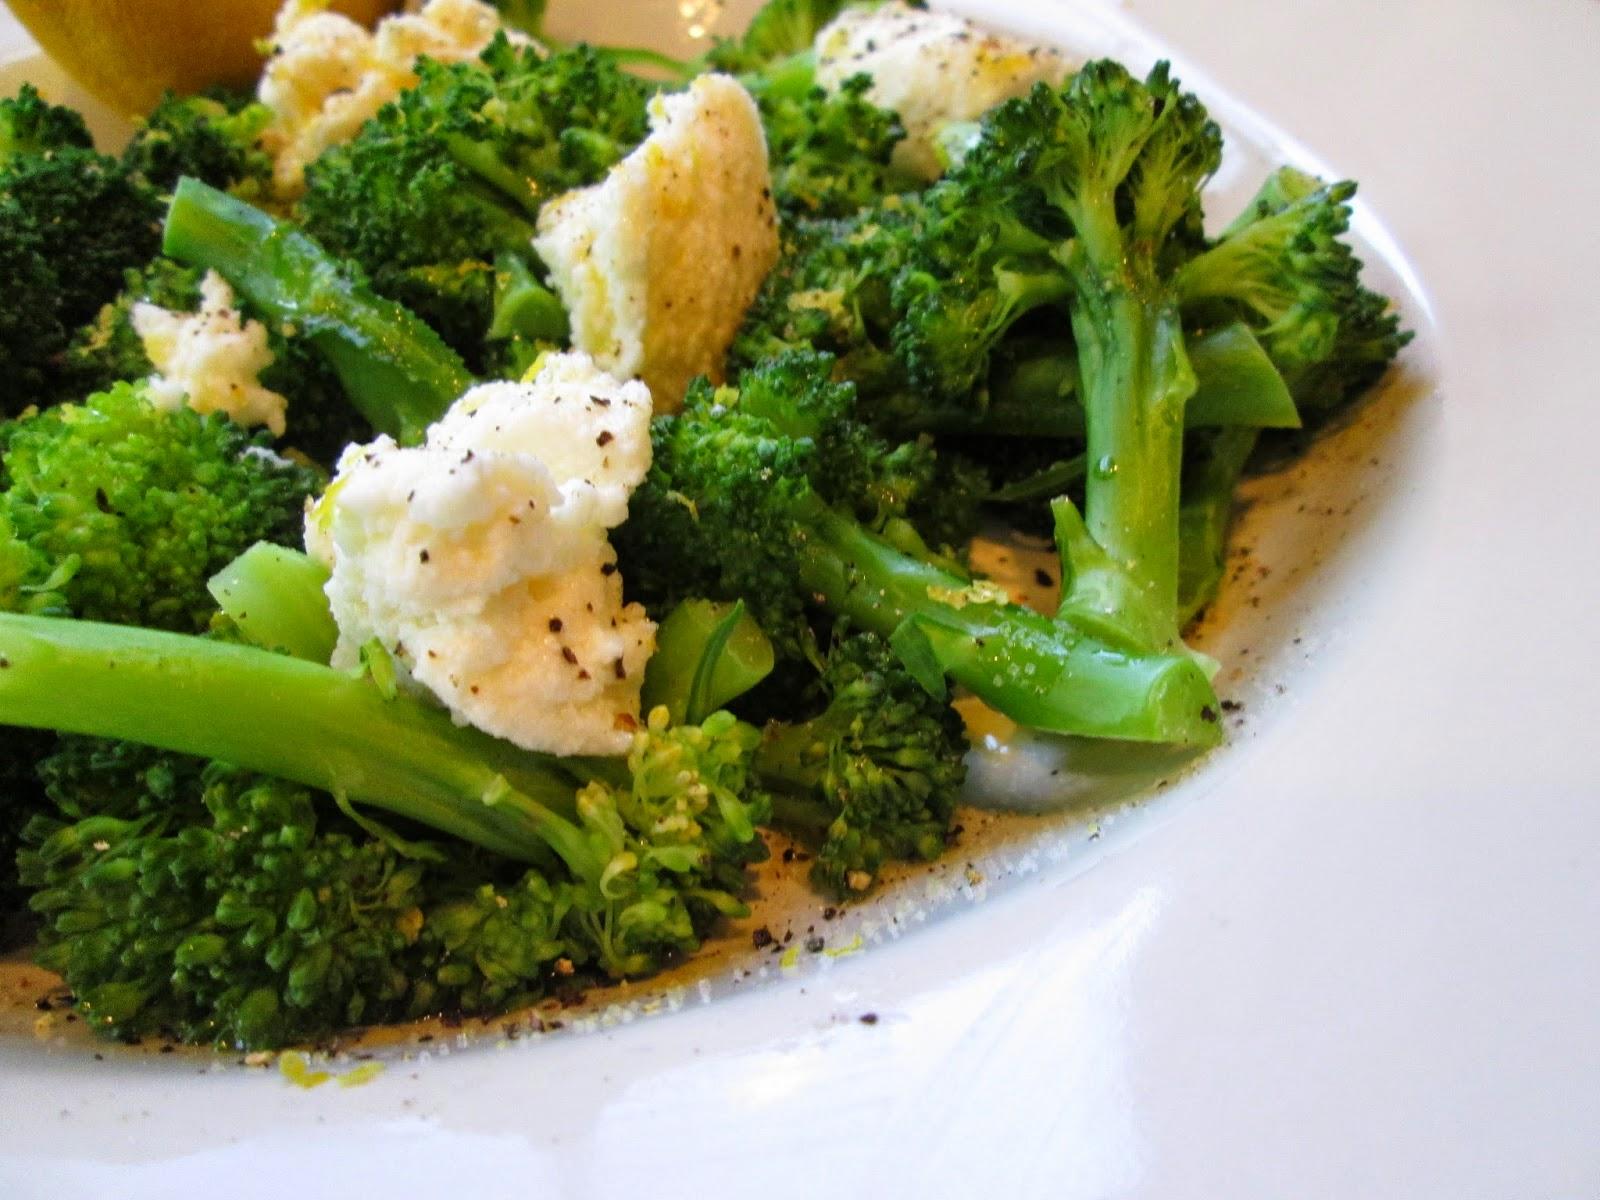 ... the Pot: Diana Henry's Broccoli with Ricotta, Lemon, and Parmesan